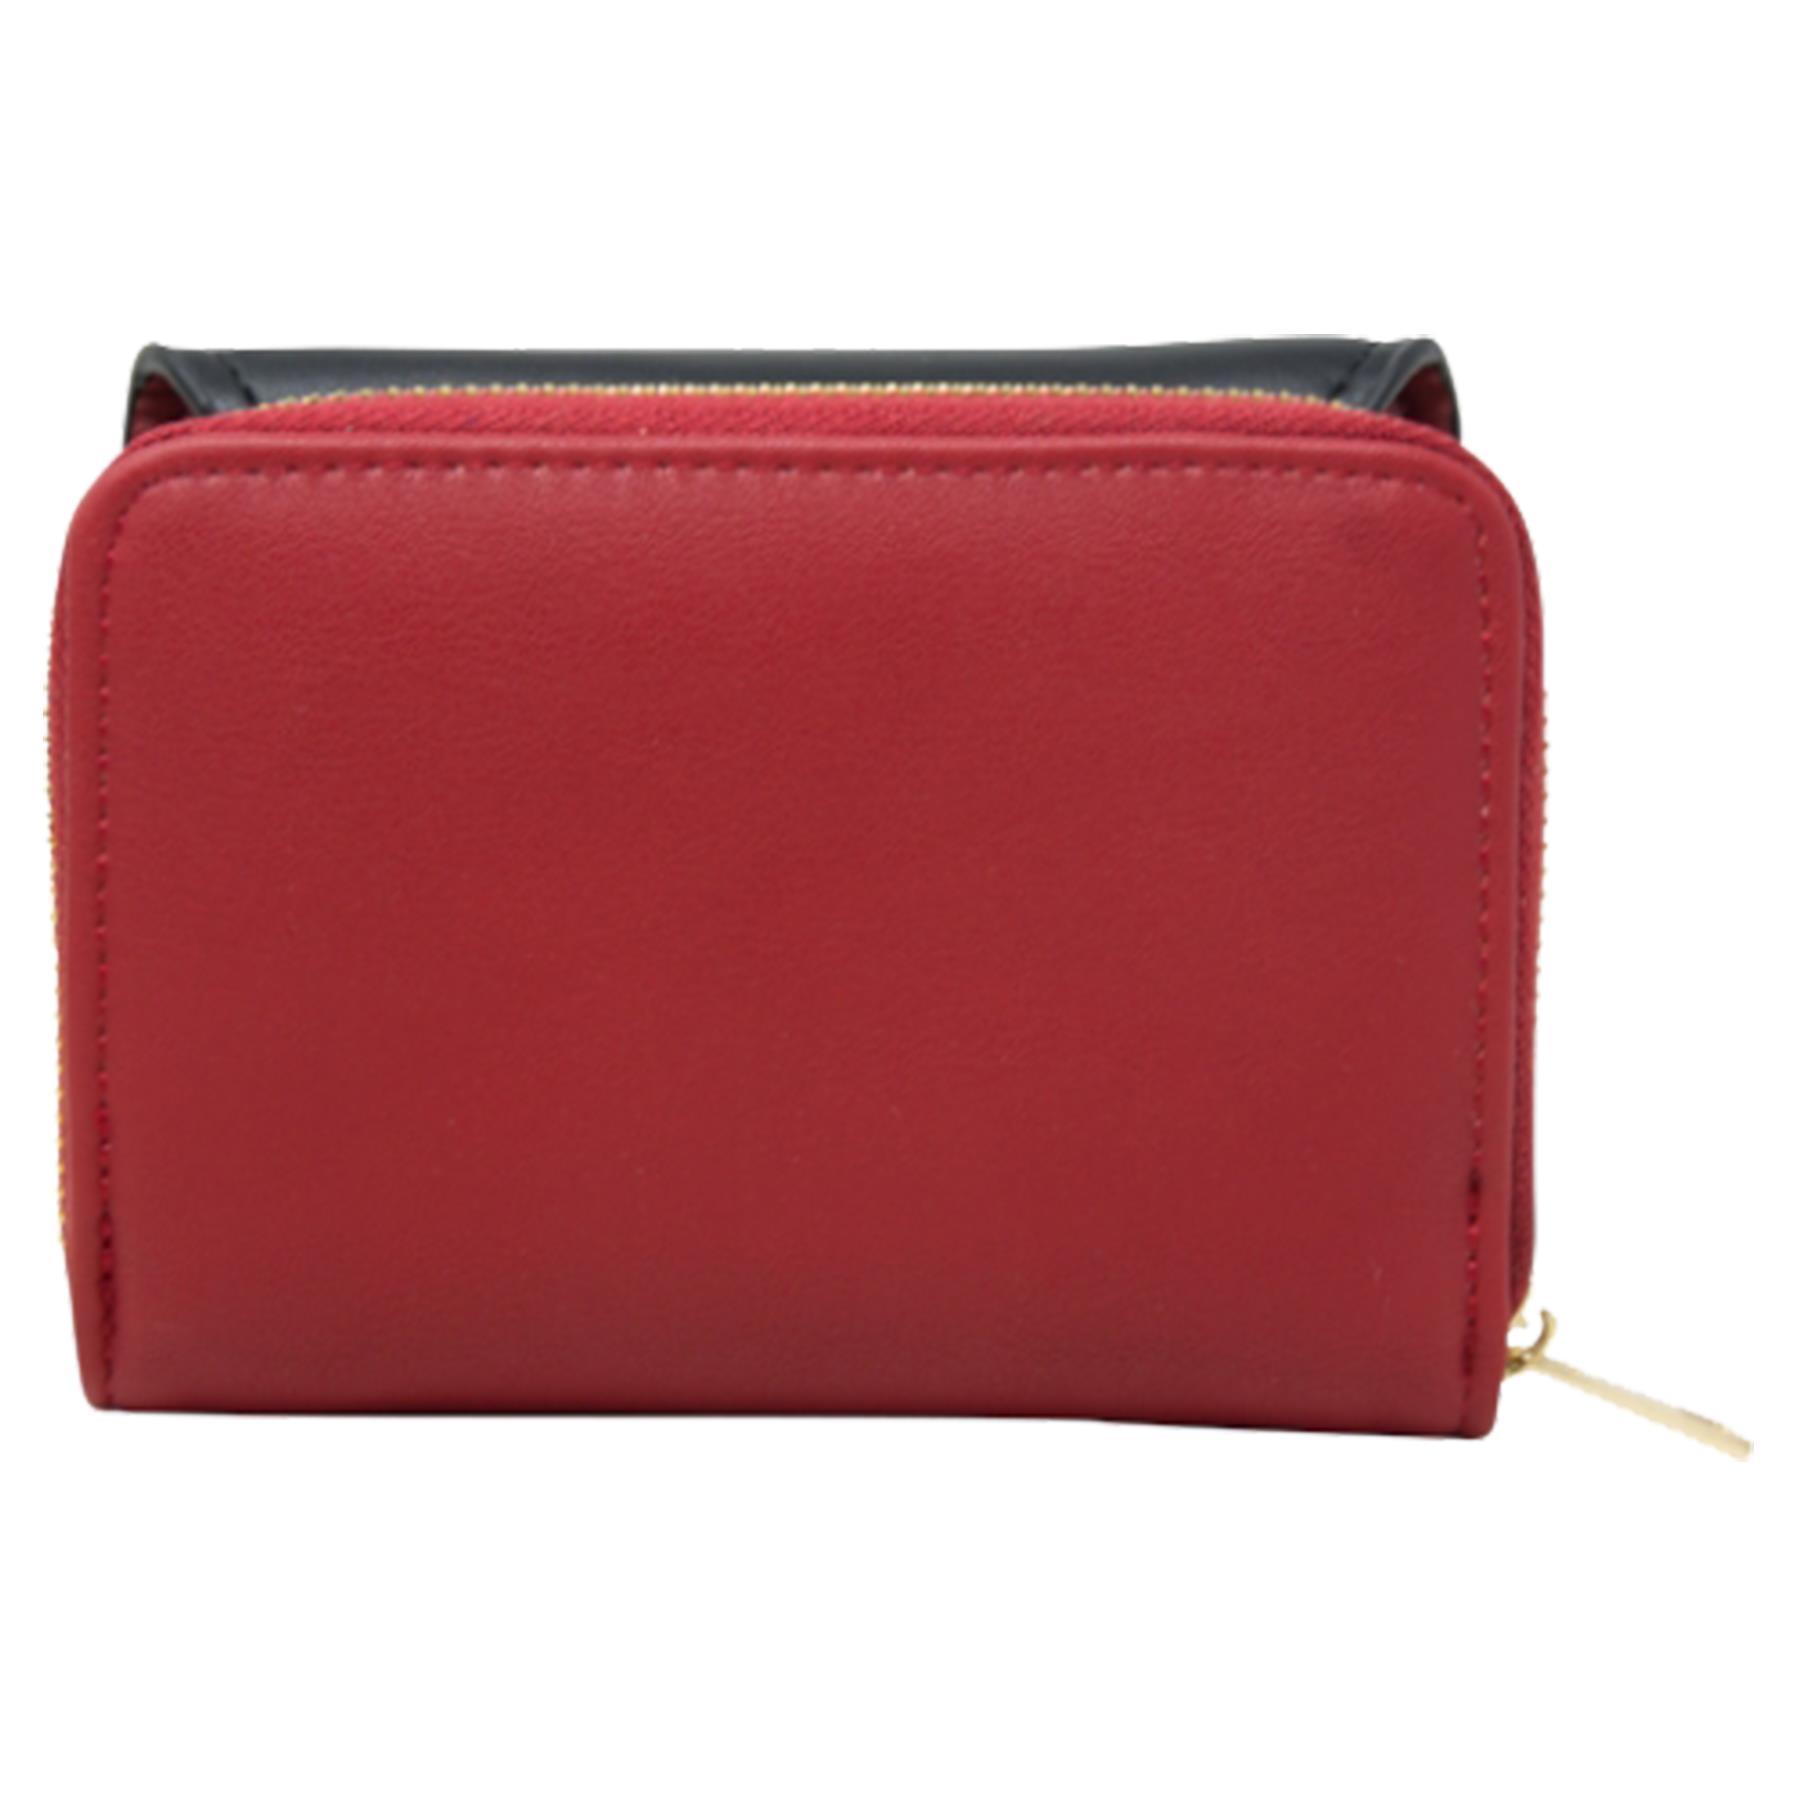 New-Ladies-Multicoloured-Envelope-Faux-Leather-Reptile-Detail-Purse thumbnail 28